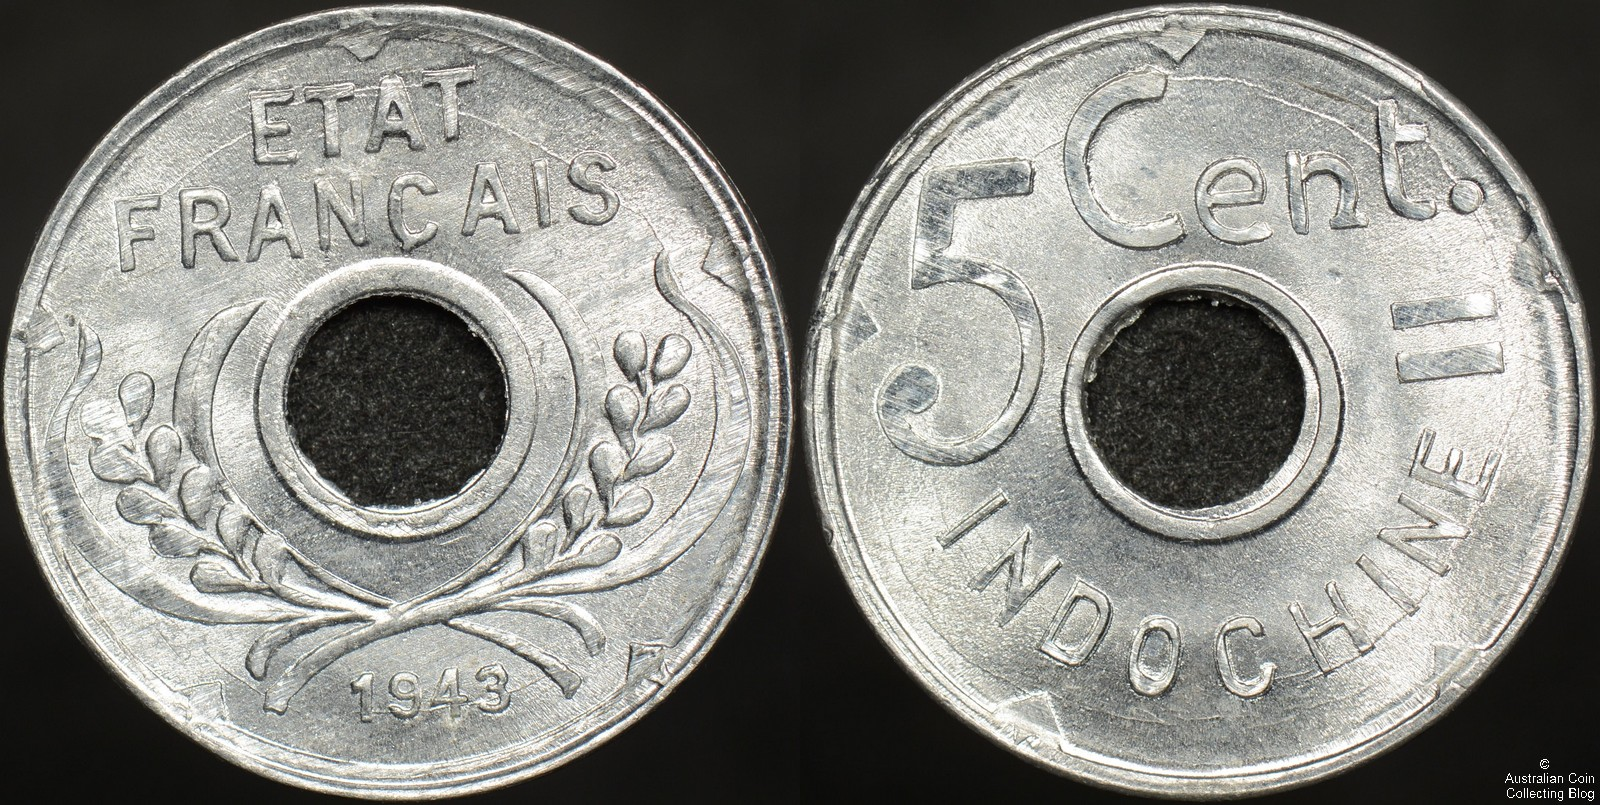 1943 French Indo-China 5c